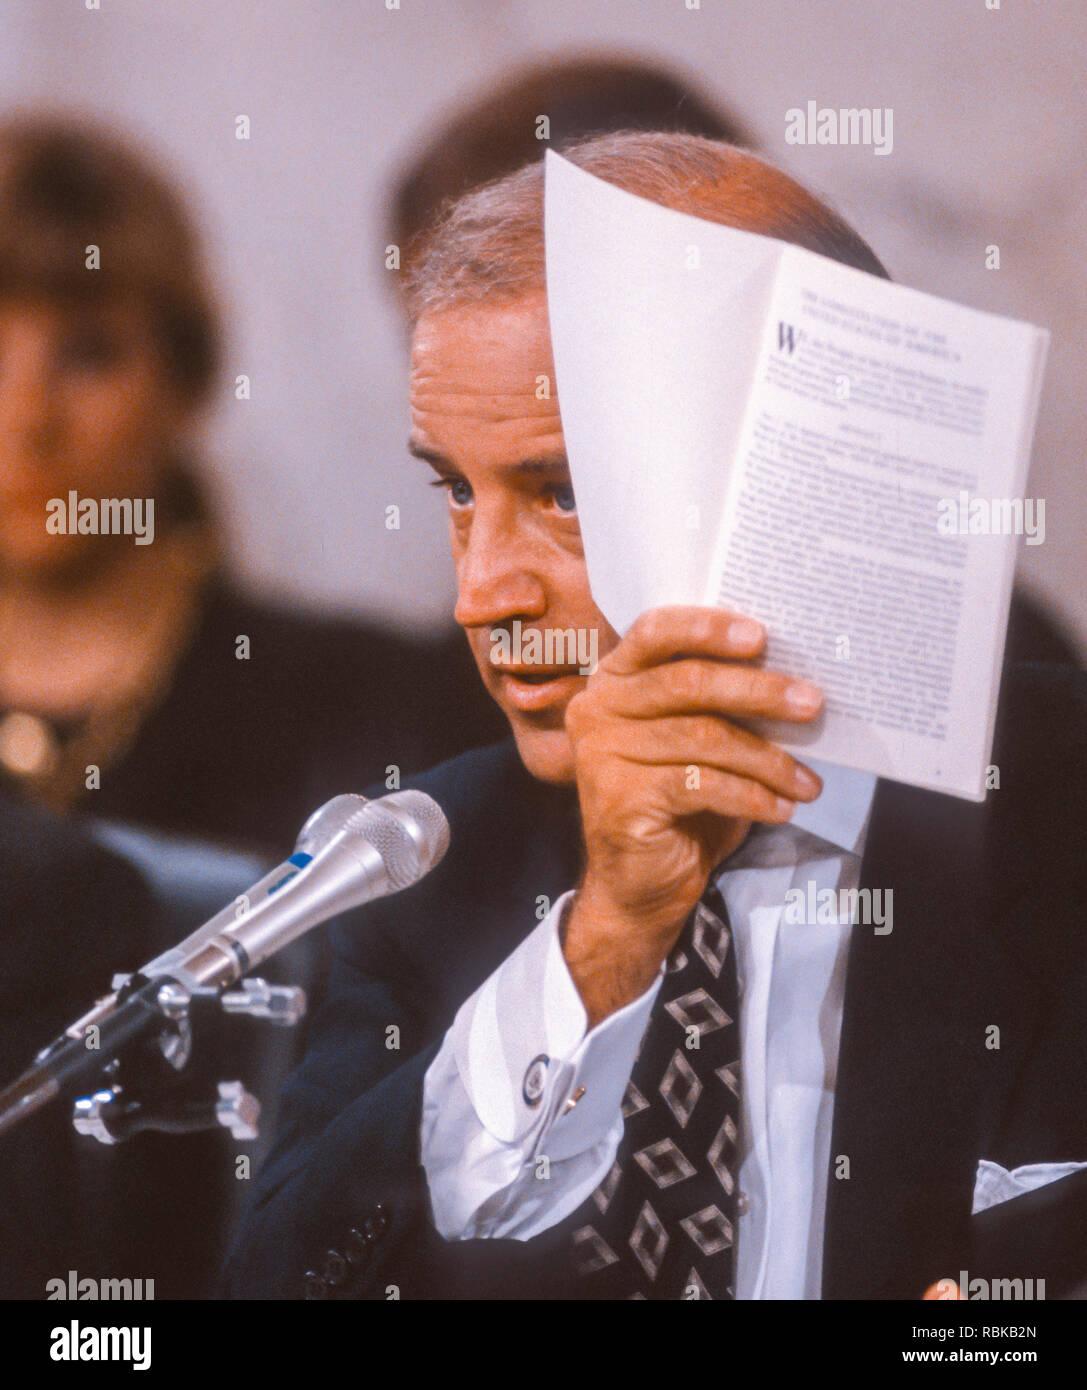 WASHINGTON, DC, USA - SEPTEMBER 12, 1991: Senator Joseph Biden (D-DE), Chairman U.S. Senate Judiciary Committee, shows Constitution, during Clarence Thomas hearing. - Stock Image